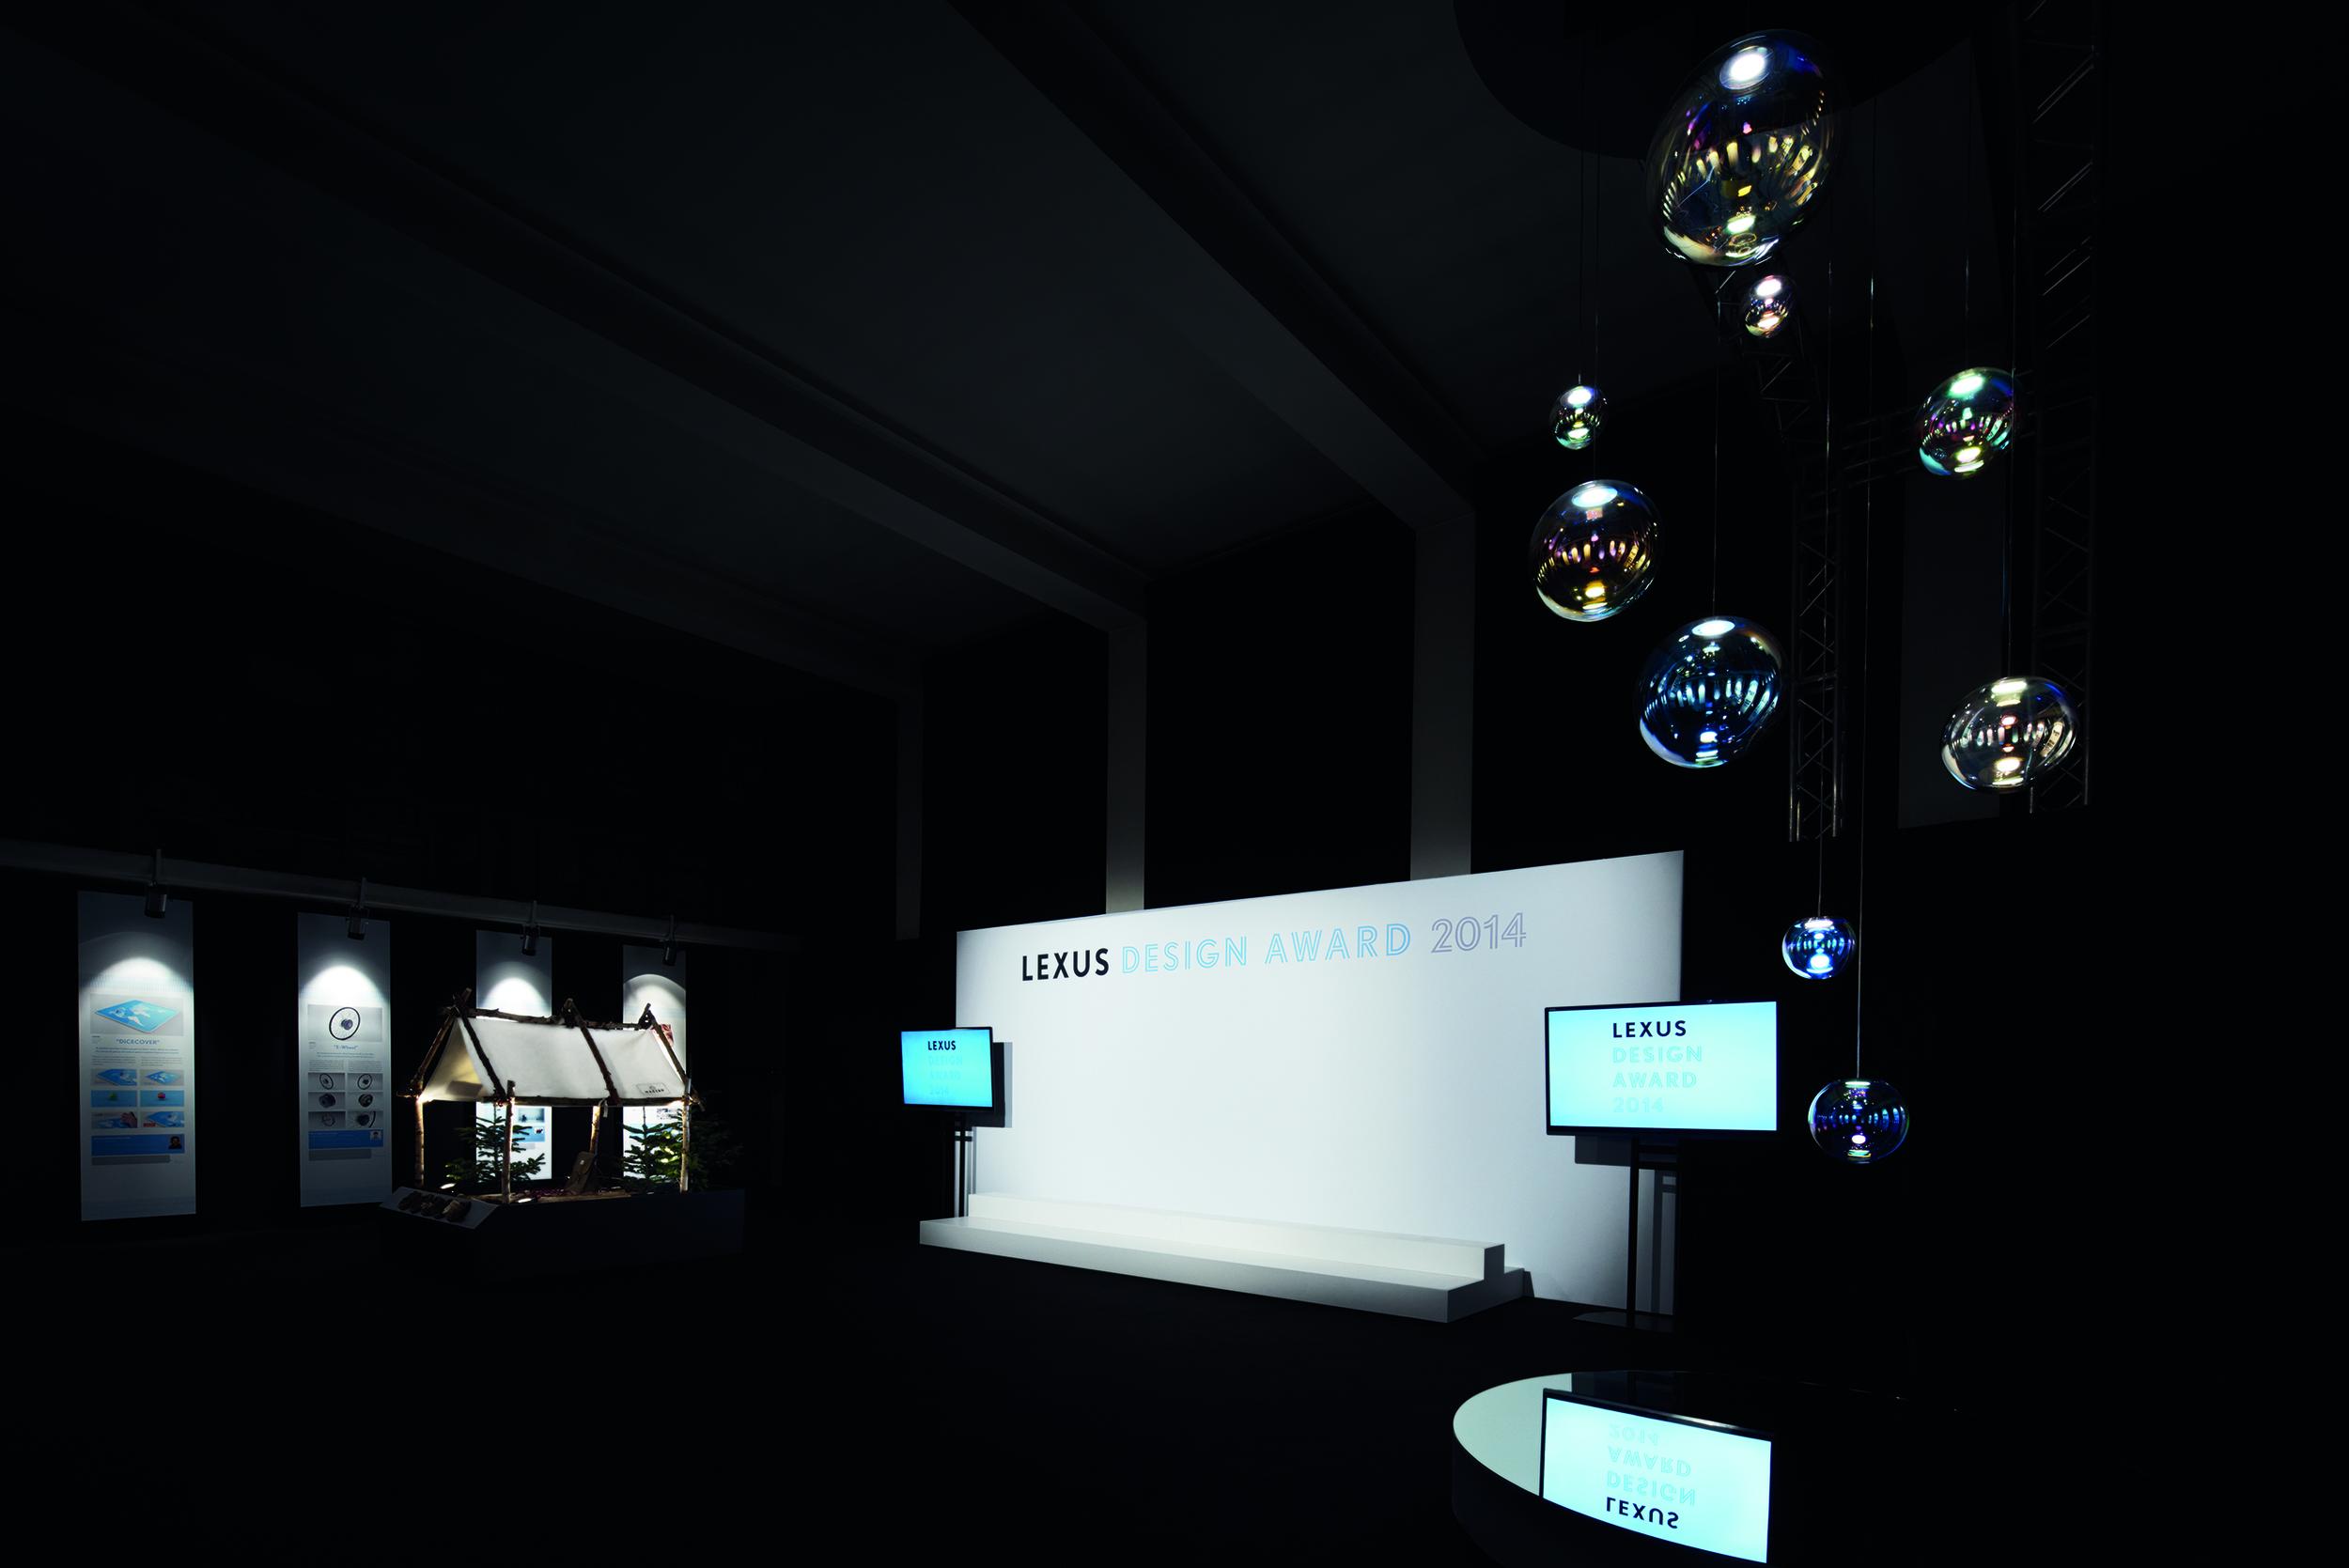 Lexus Design Award 2014 Venue